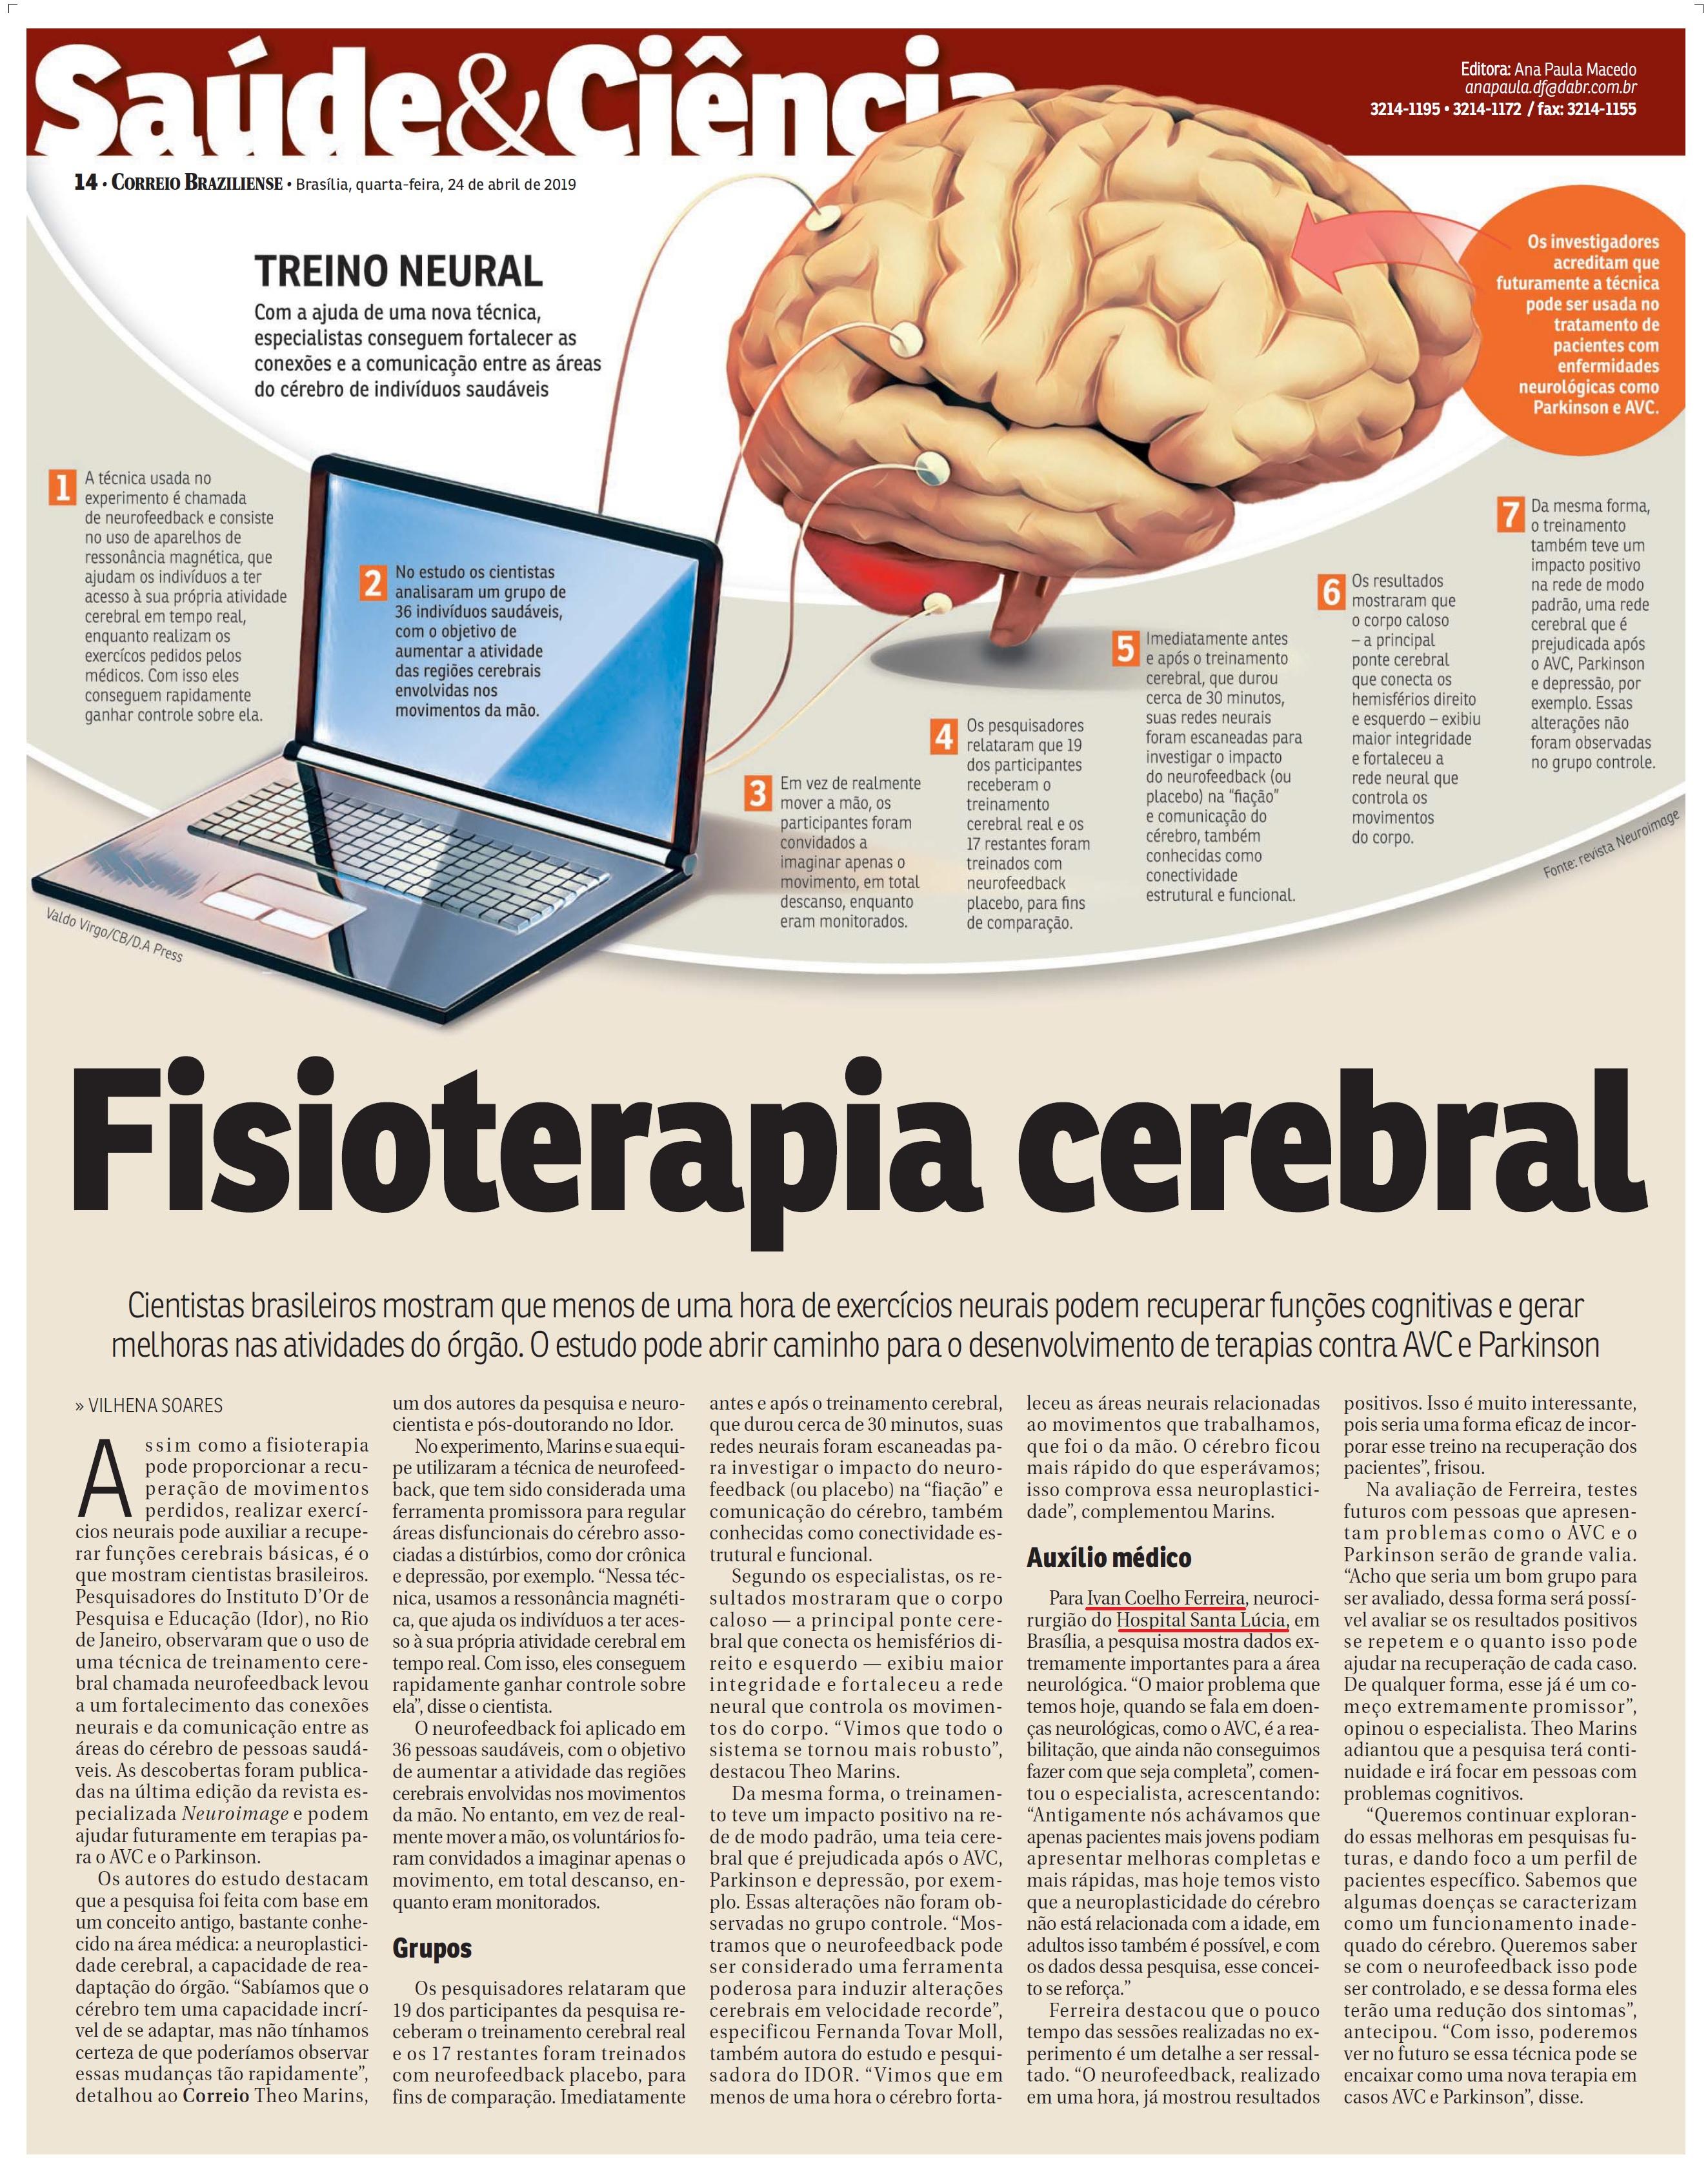 Correio Braziliense - Dr. Ivan Coelho HSLS - 24-04-2019